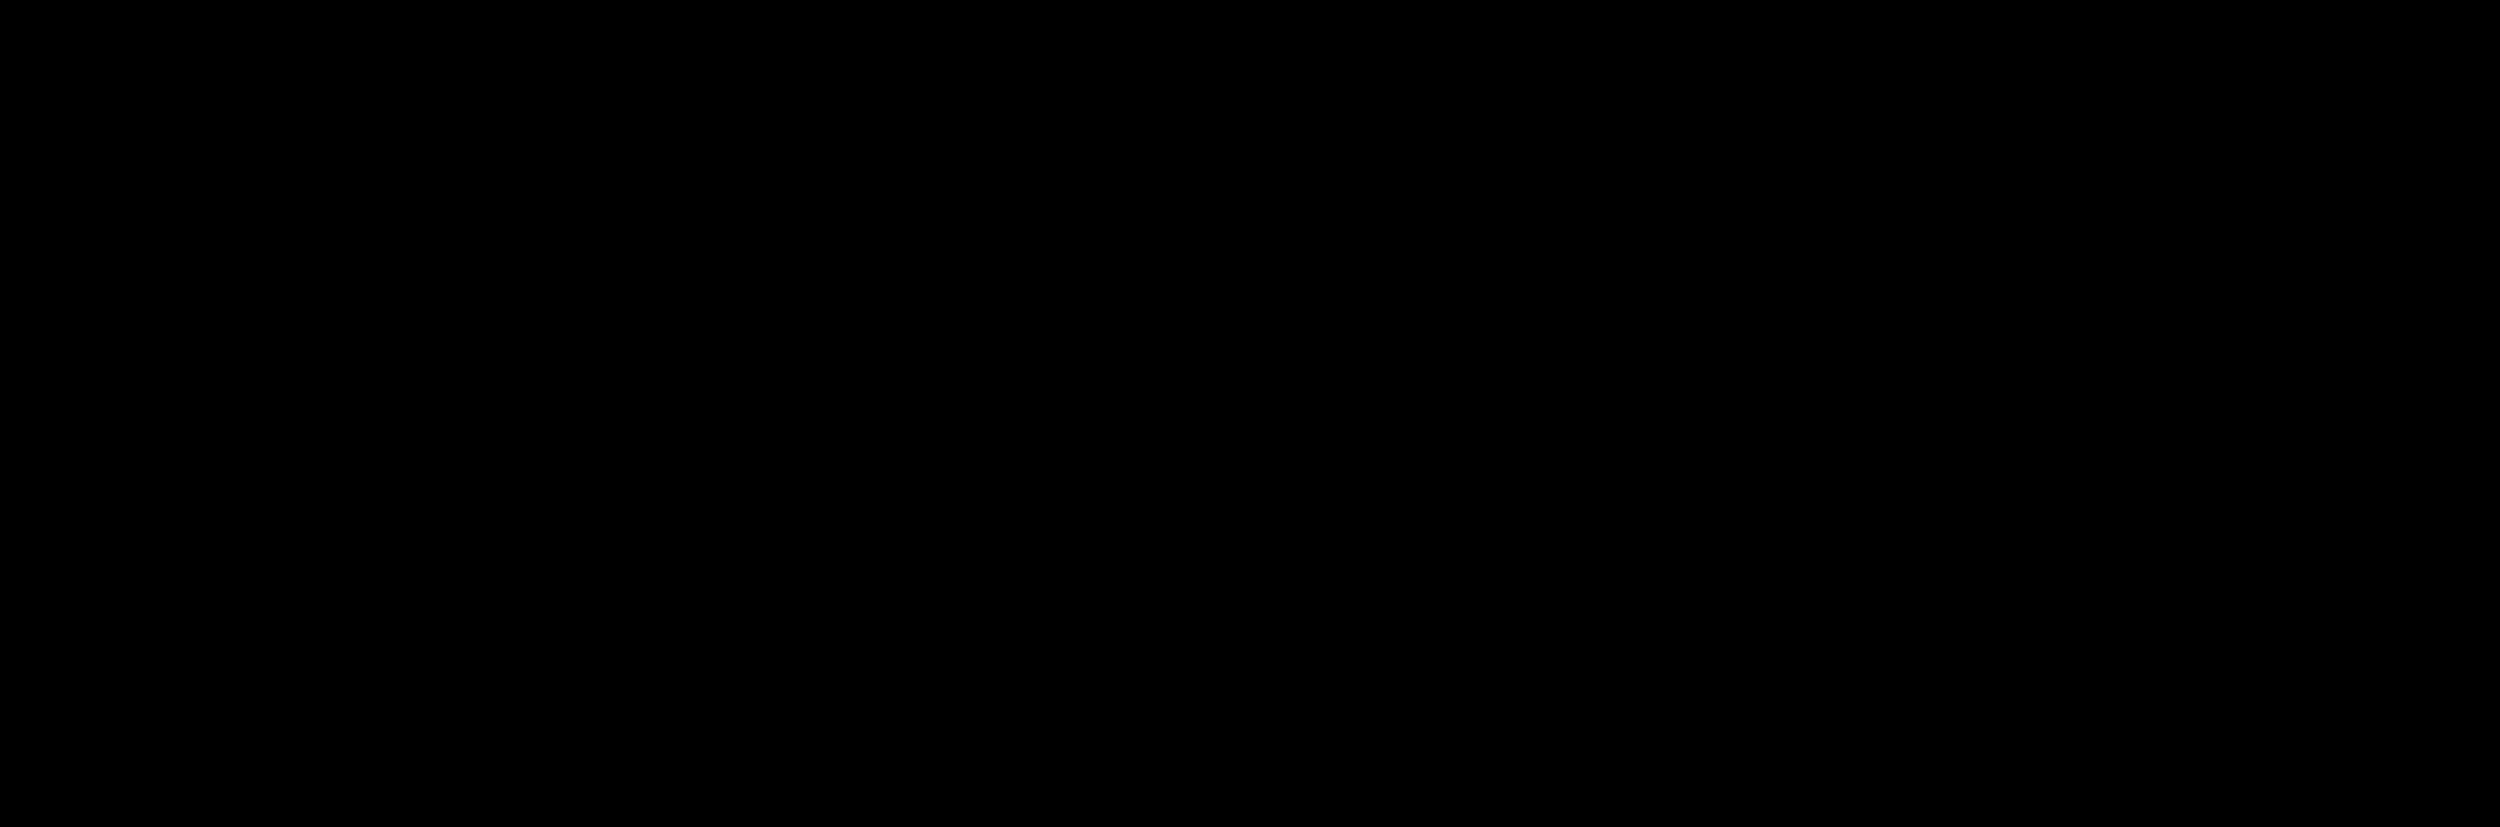 M2M_BLACK_01.png